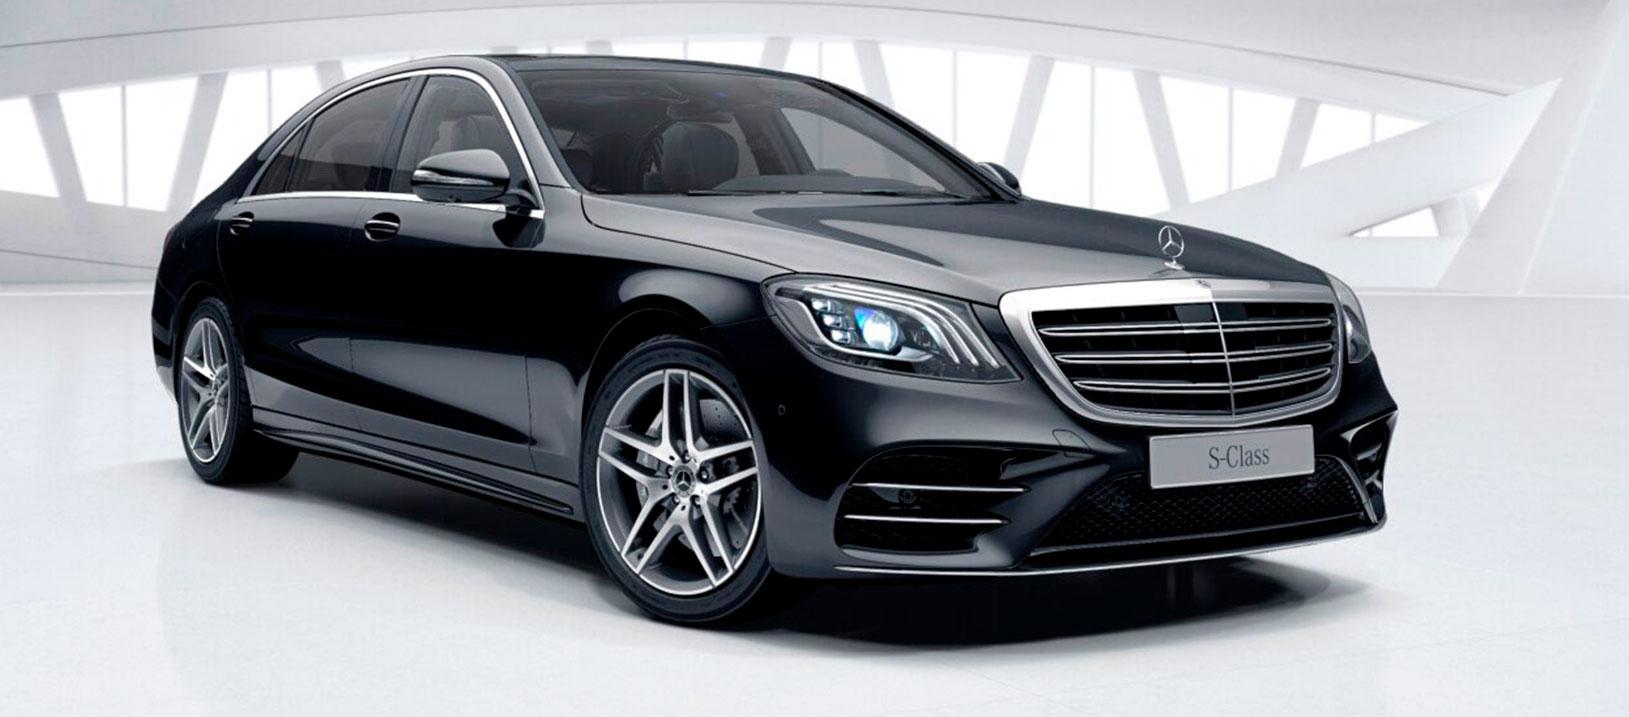 Mercedes-Benz S 400 d 4MATIC long 52600181